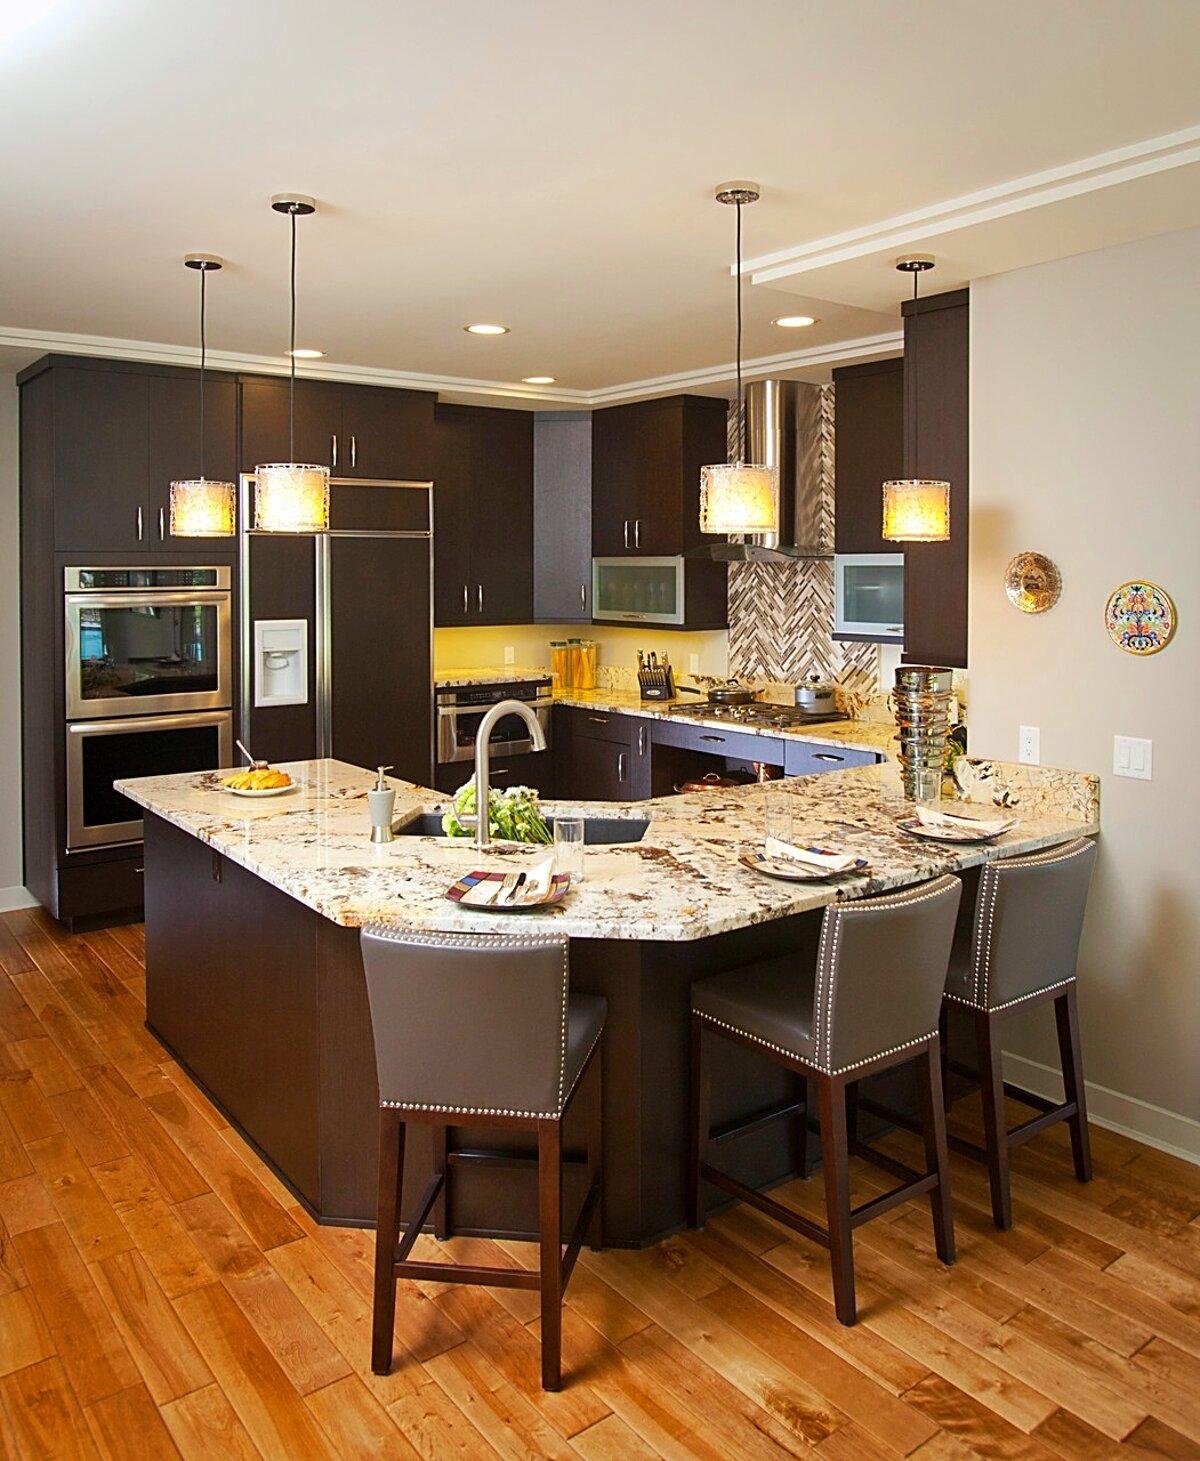 cincinnati cabinets and appliances - howard's kitchen studio